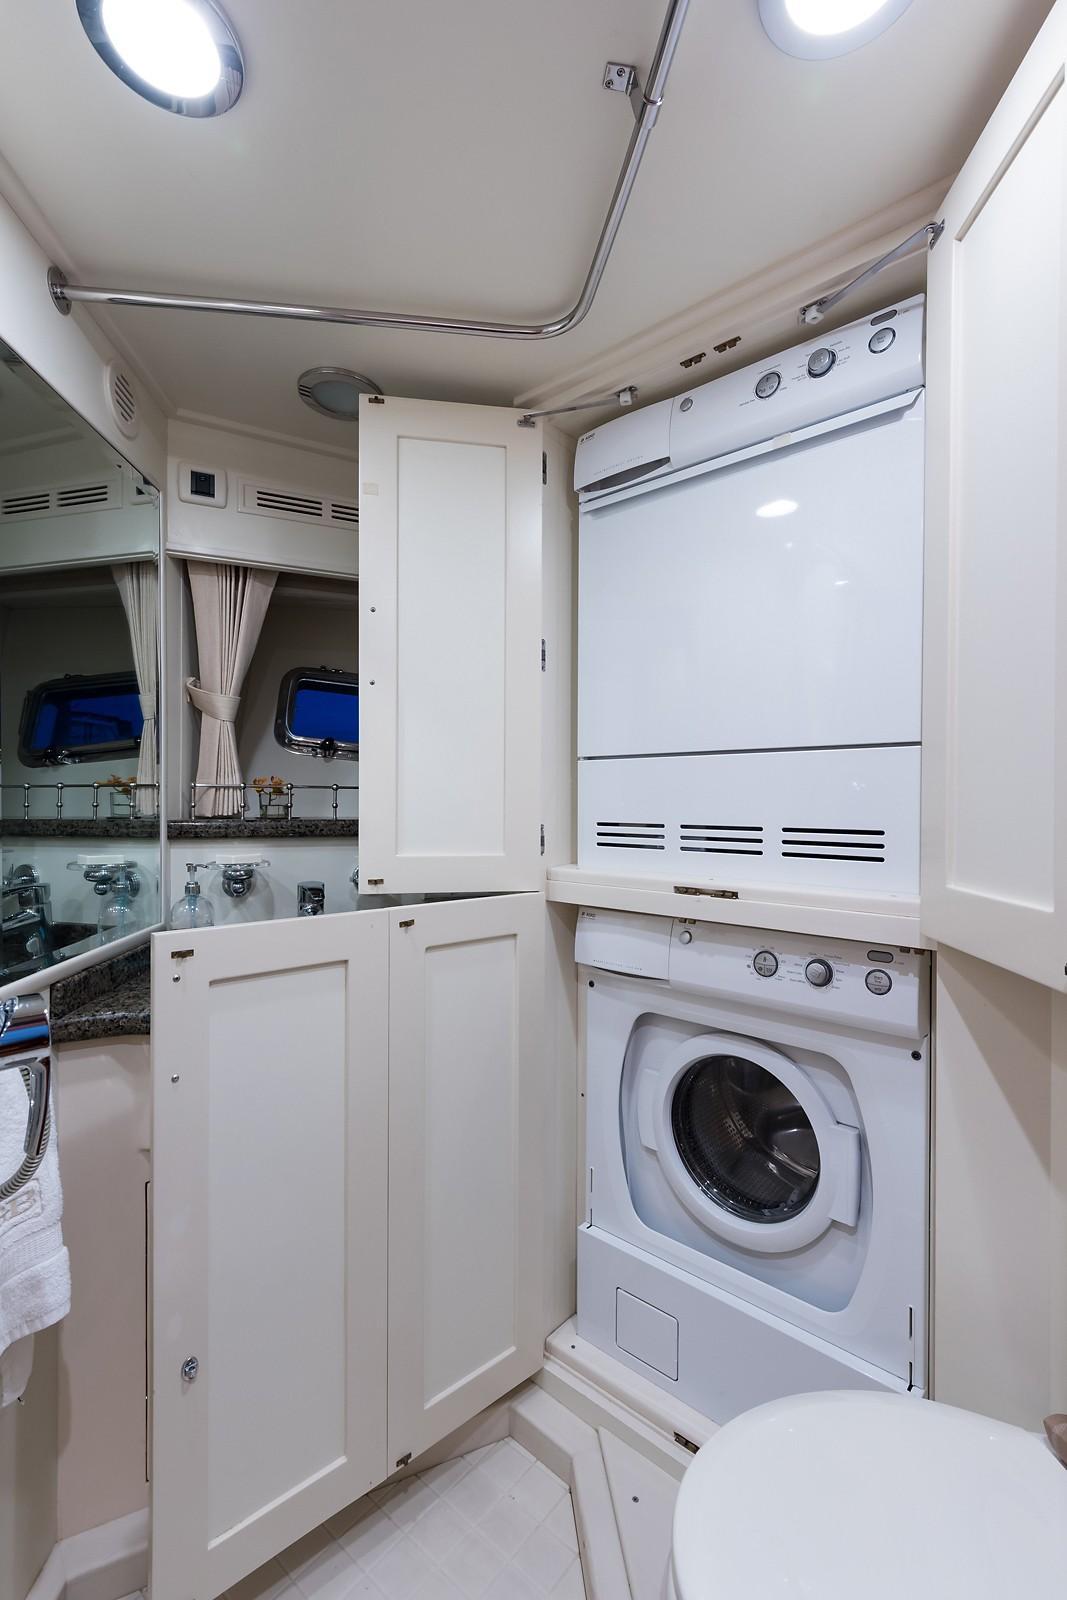 59 Grand Banks Laundry